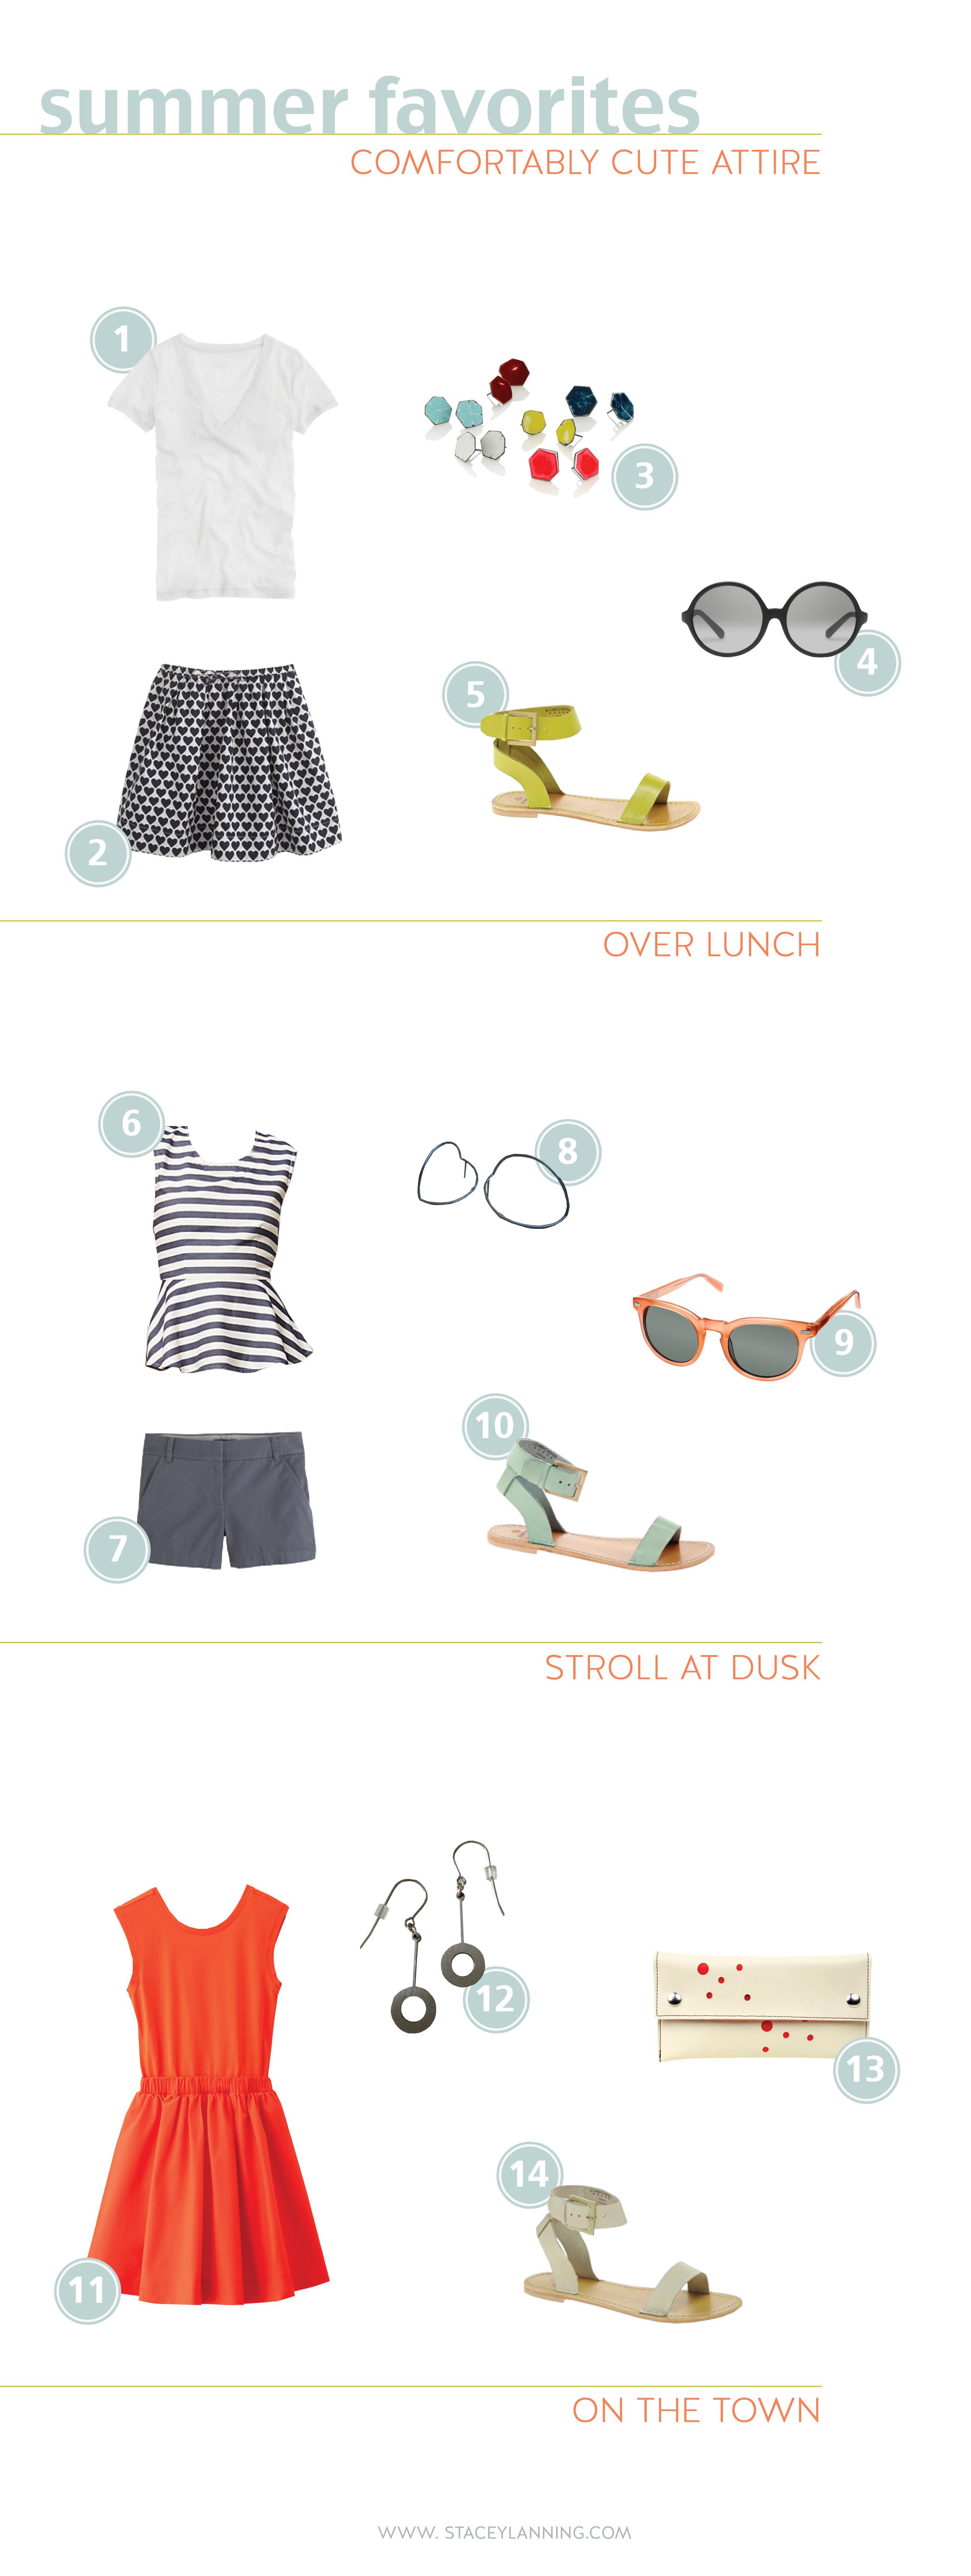 summer-favorites-inspiration-staceylanning